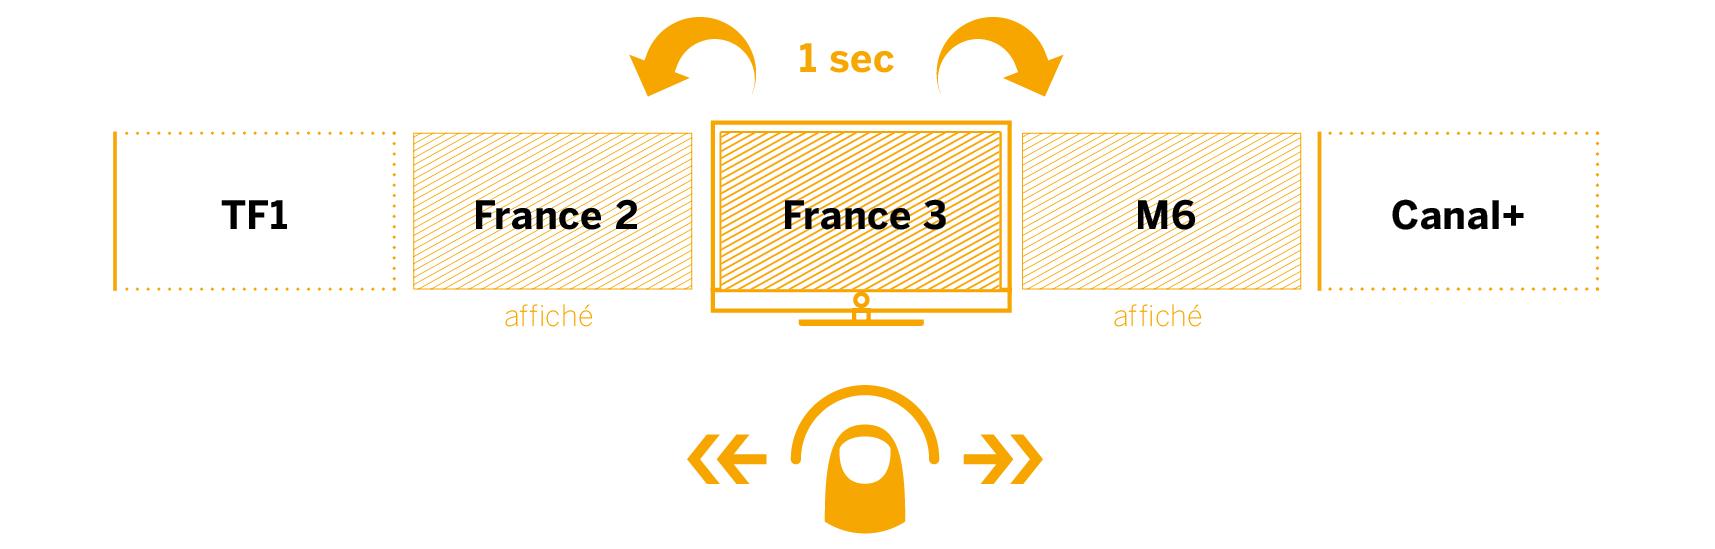 Loewe instant Channel ChangementLoewe instant Channel Changement rapide des chaînes. Loewe Art 48 UHD controlsound